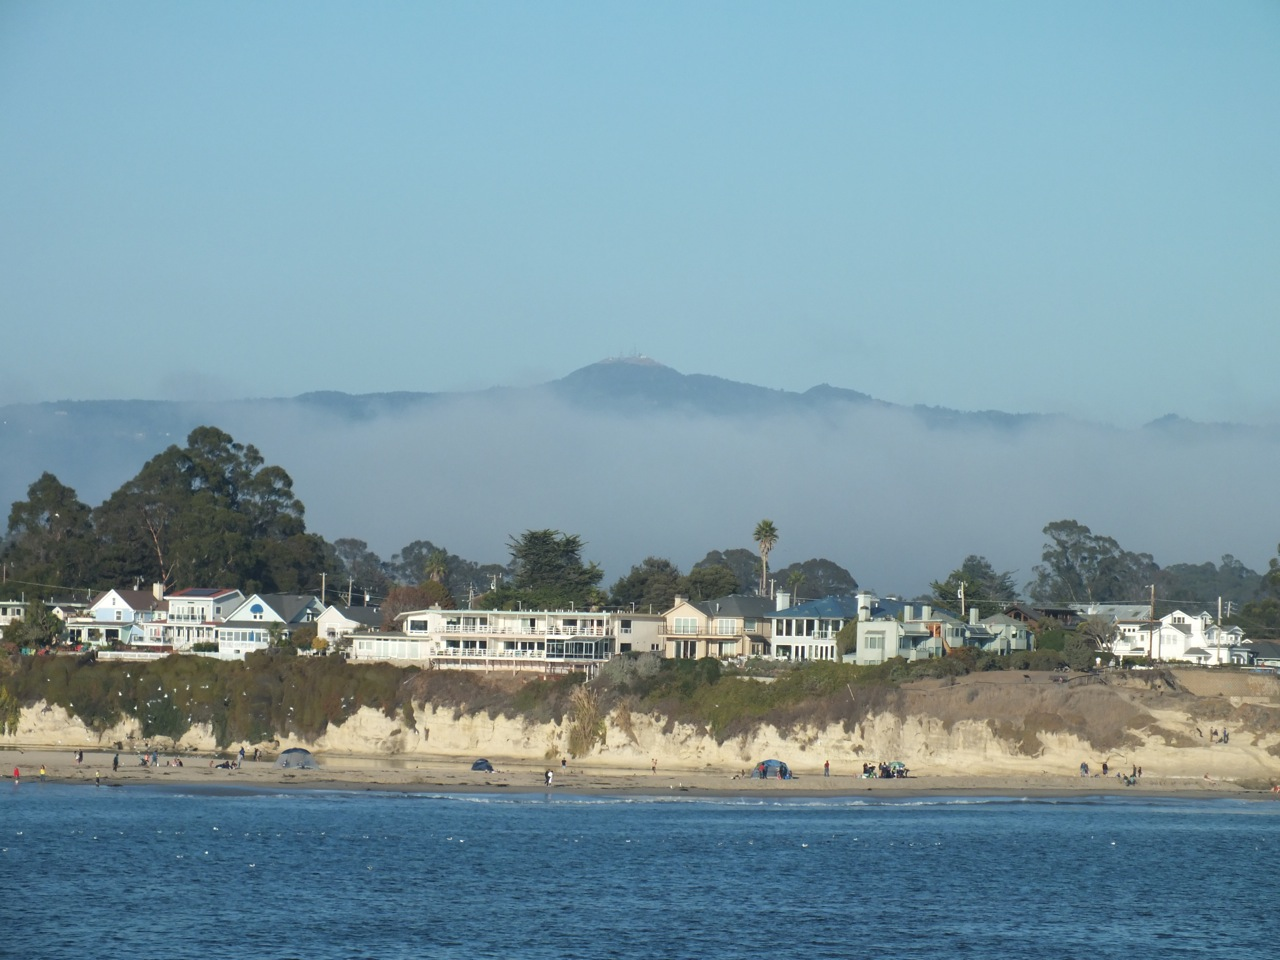 Loma Prieta shrouded in fog from Santa Cruz Wharf